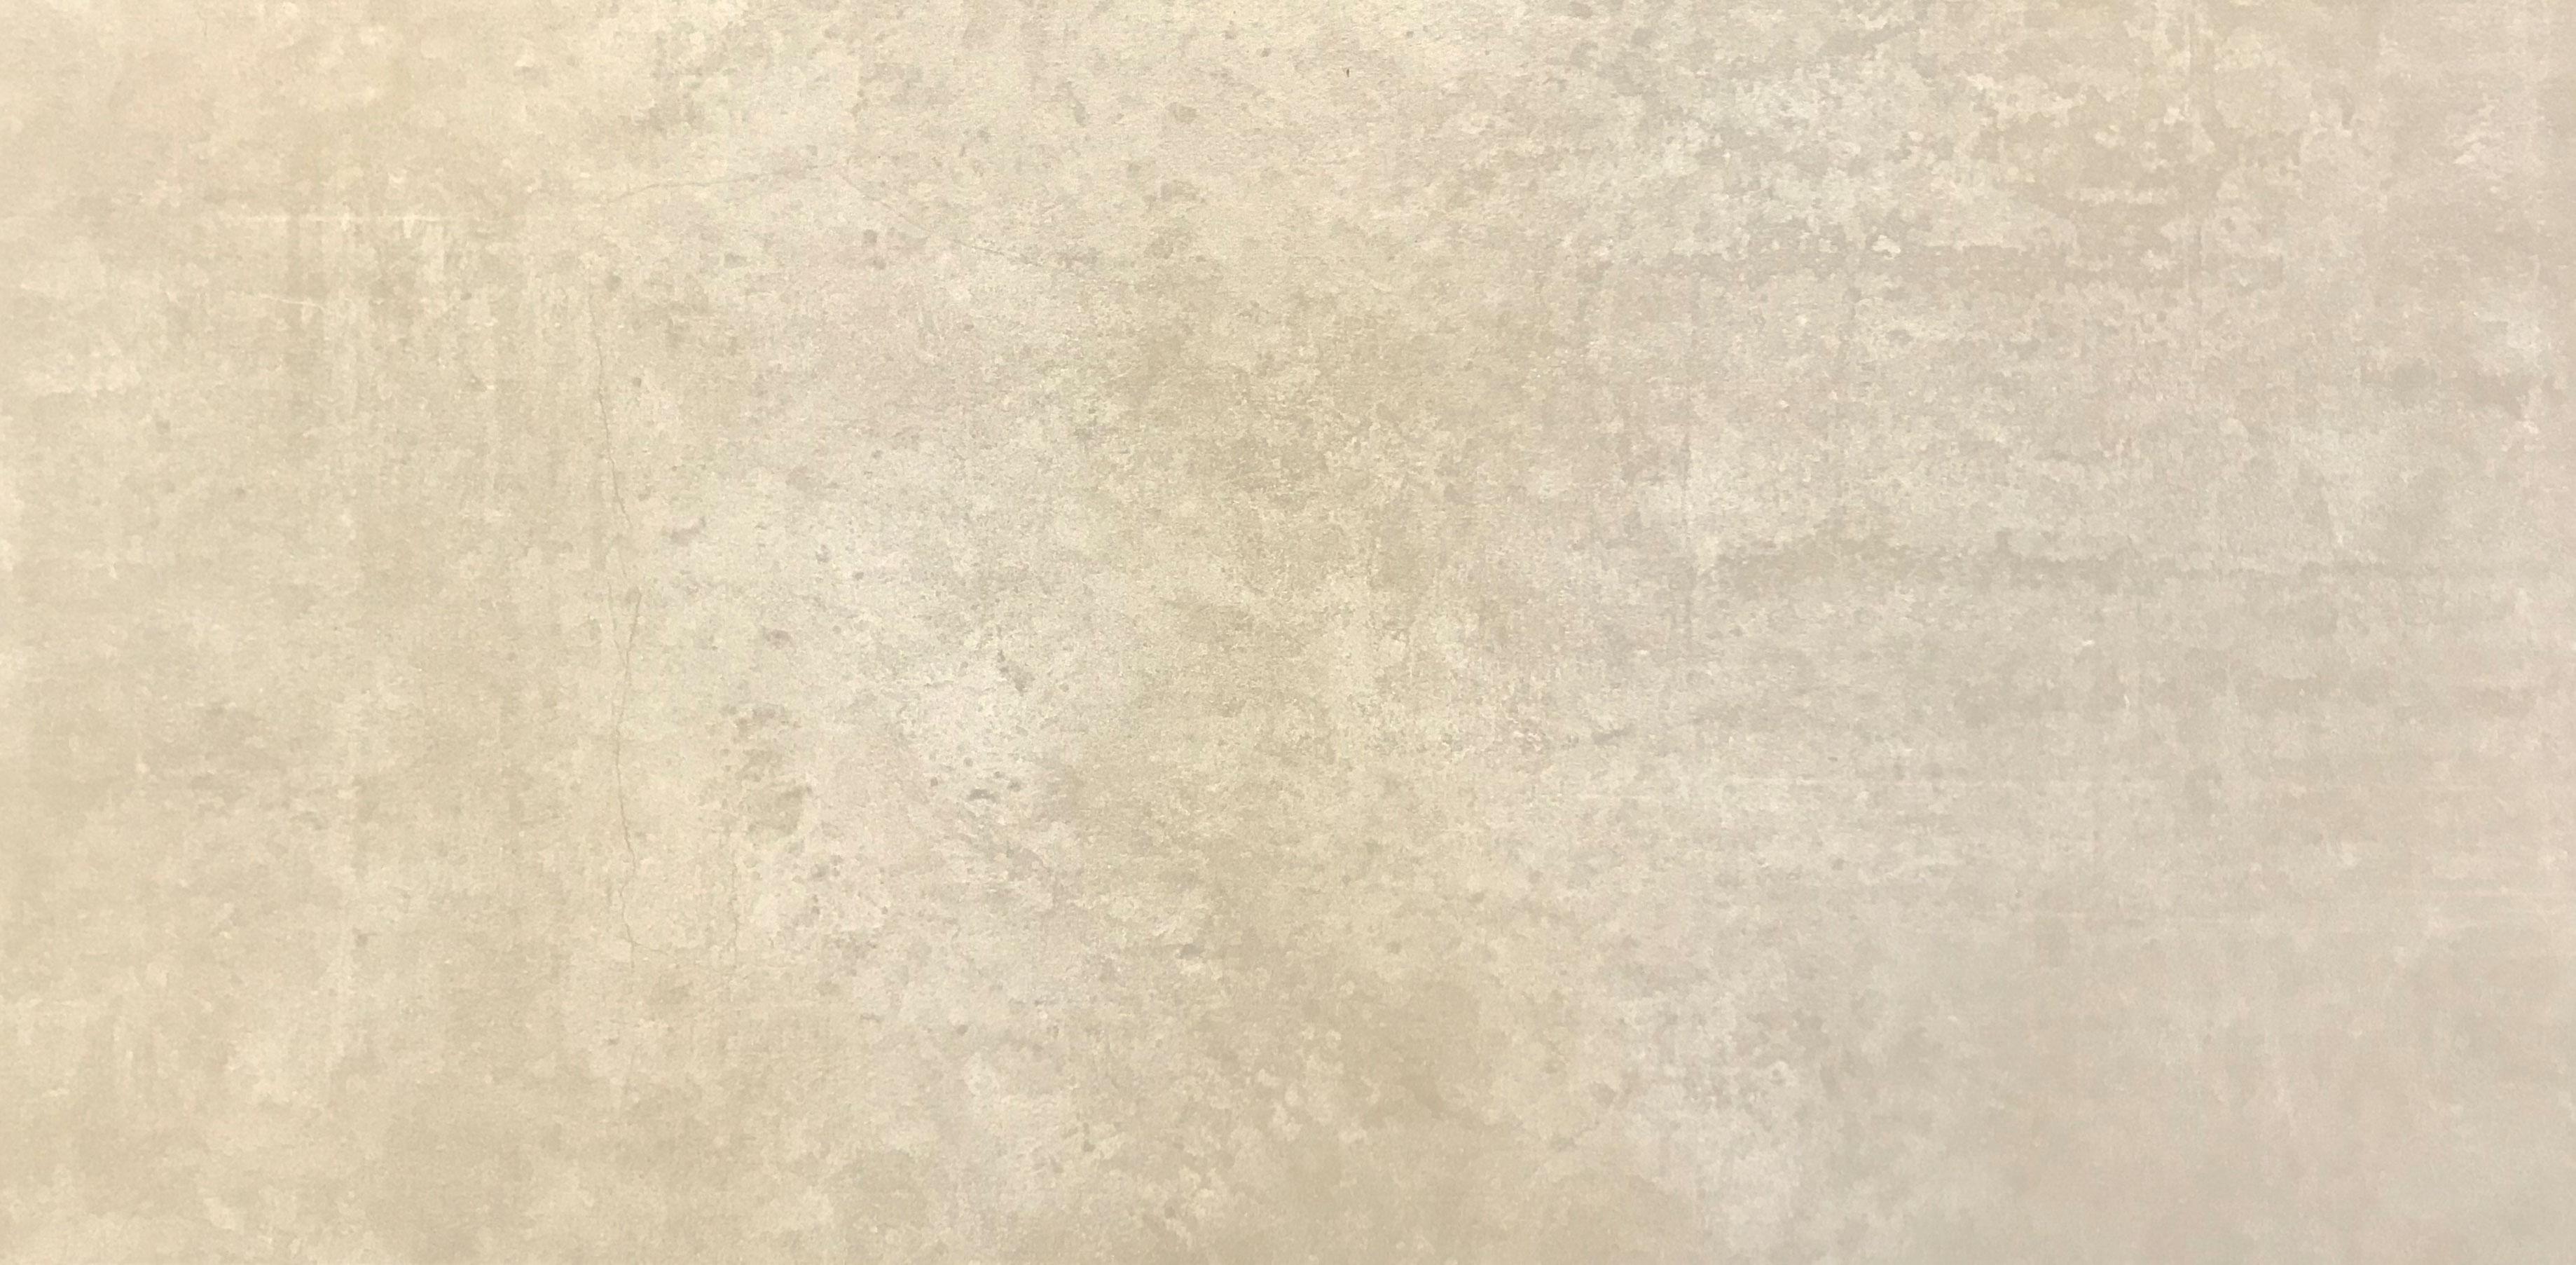 Interbau Blink Tessin matt Boden-/Wandfliese Loftbeige 35x70